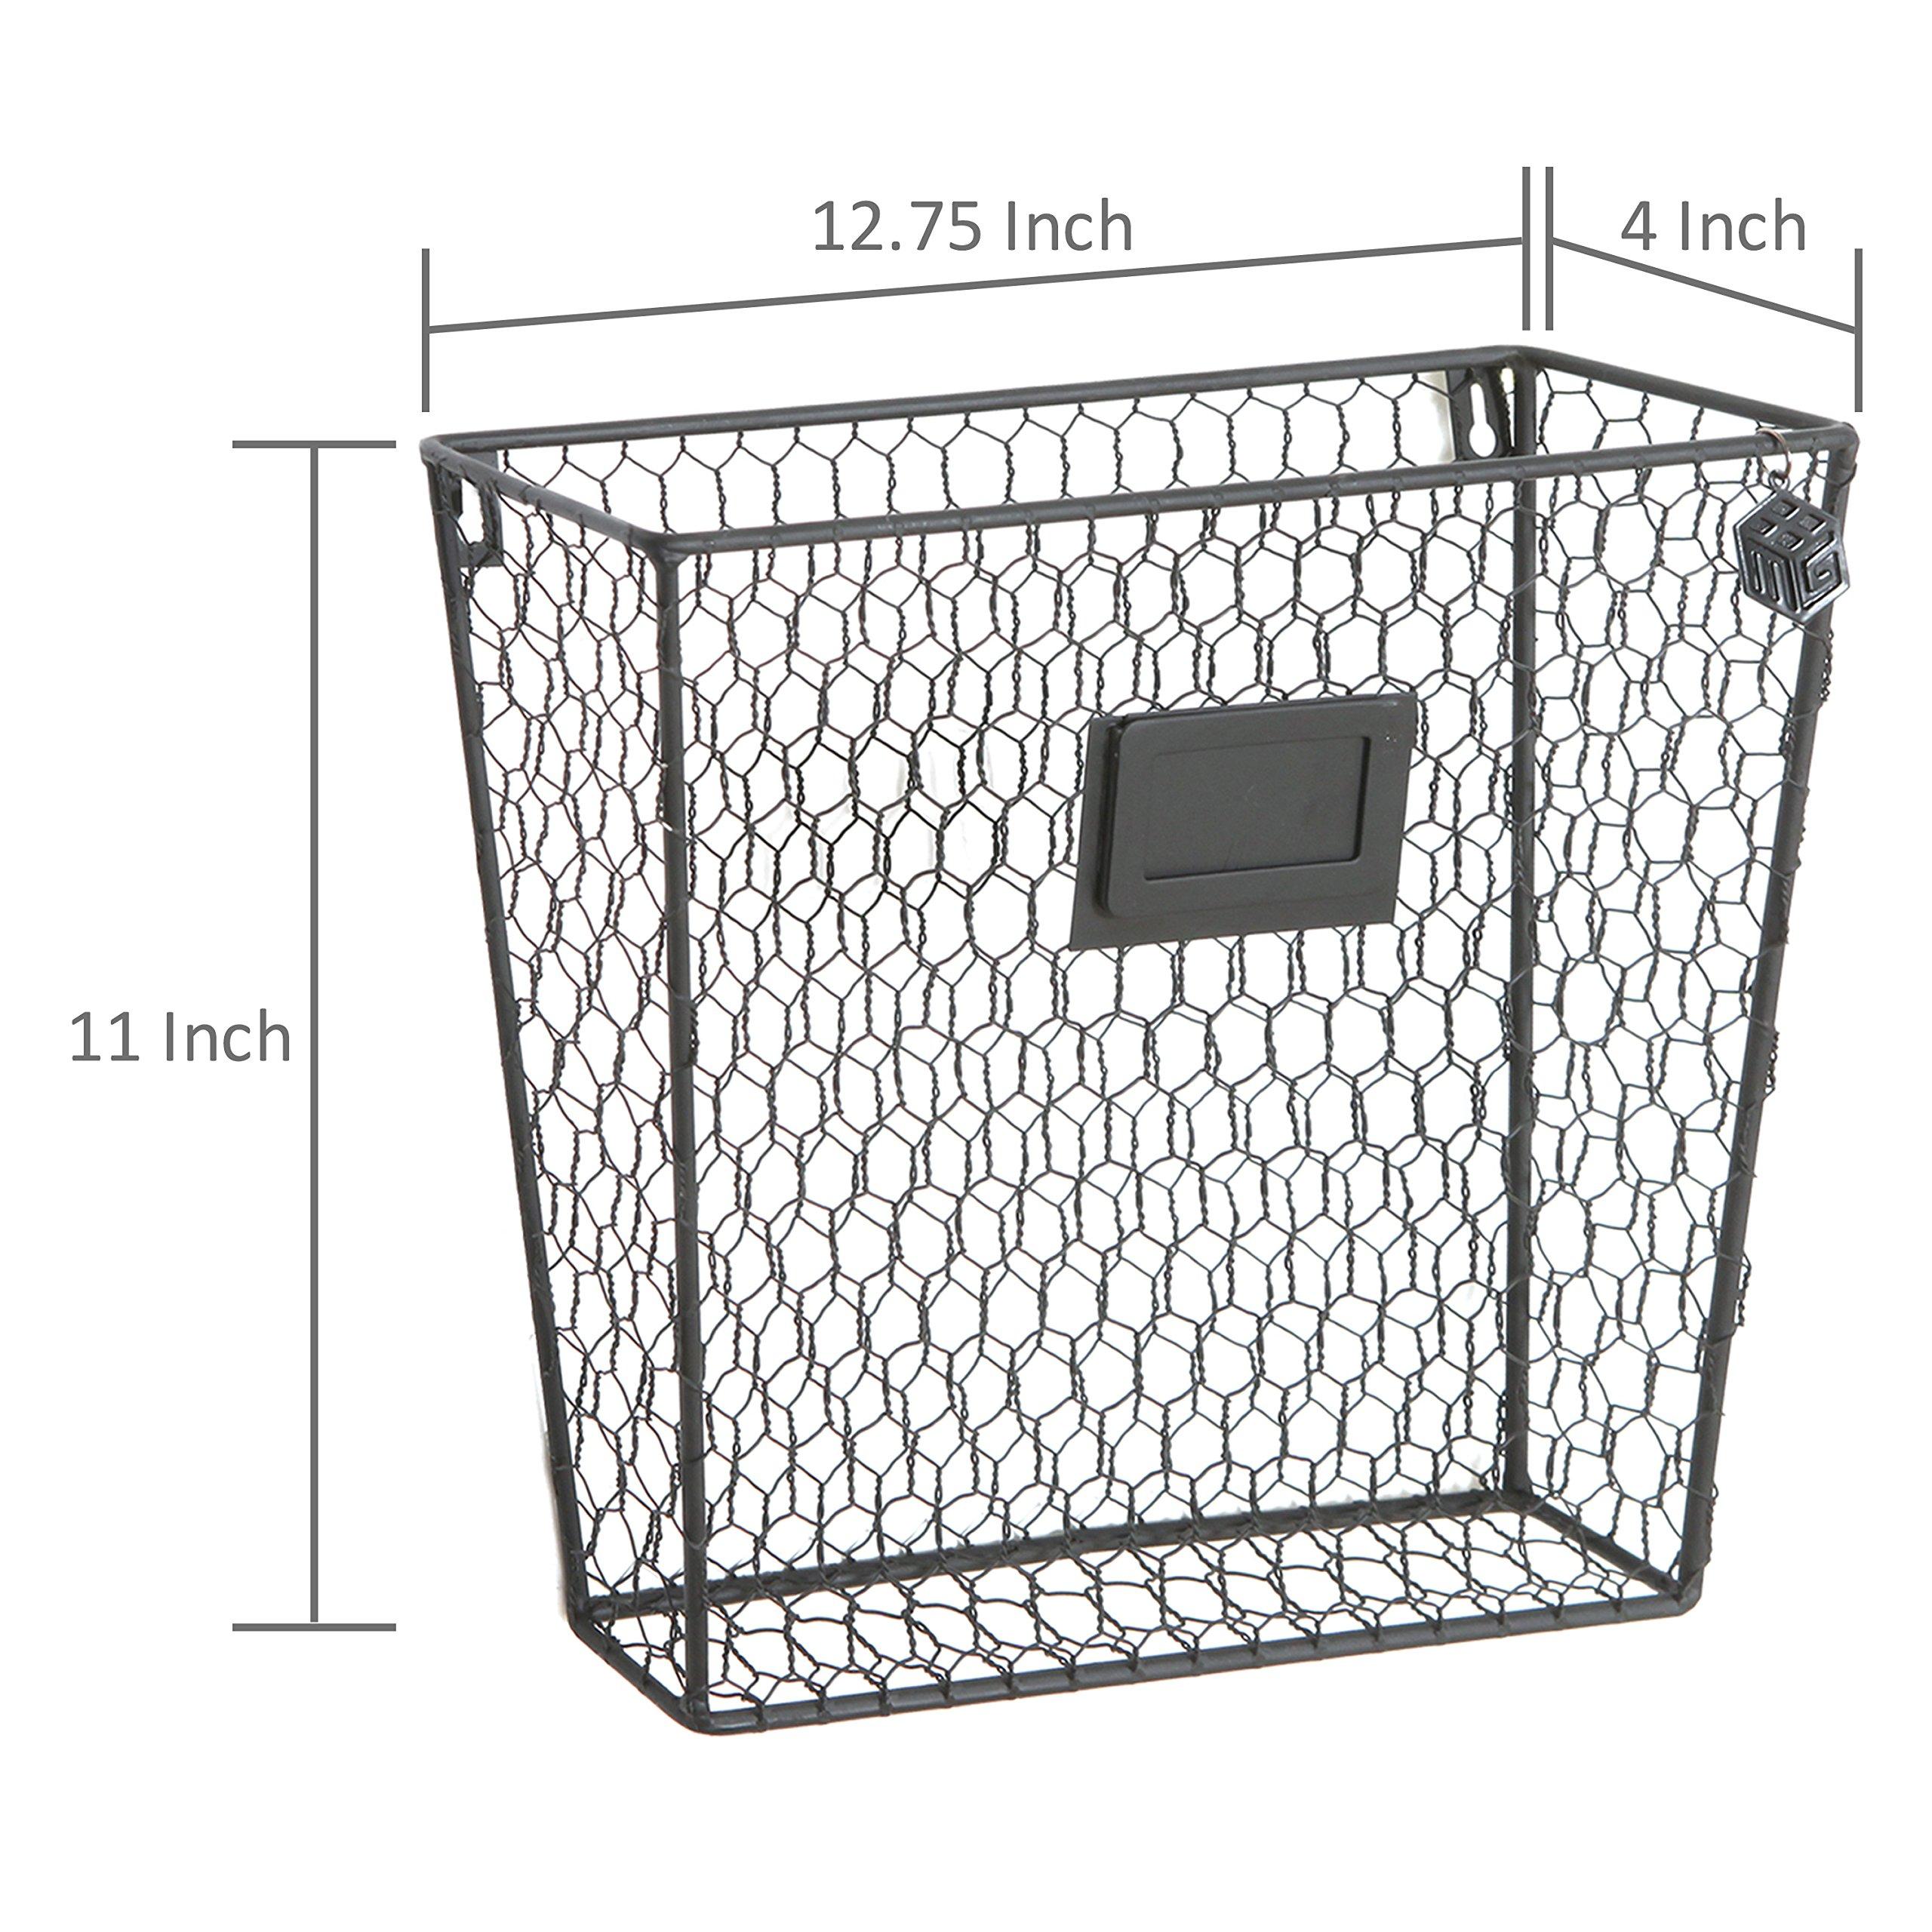 MyGift Rustic Chicken Wire Wall-Mounted Magazine & File Folder Baskets w/Chalkboard Label Inserts, Set of 2 by MyGift (Image #7)